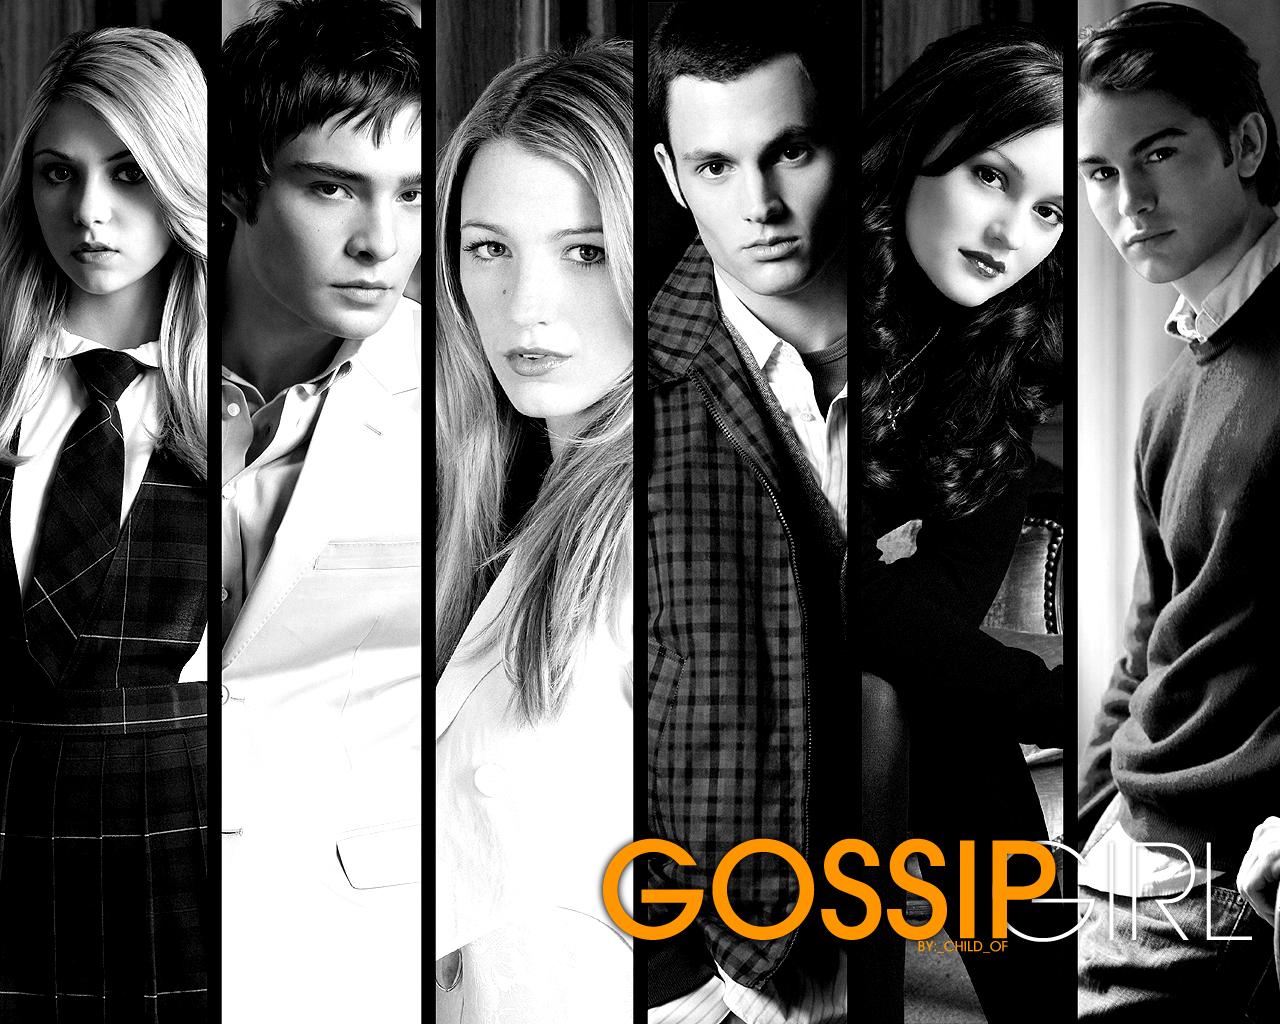 http://1.bp.blogspot.com/-HOMD0mpBHsQ/TtuTiA1HYNI/AAAAAAAAEks/gF_Y6iEkamo/s1600/Gossip_Girl_Wallpaper_2_by_childof.jpg